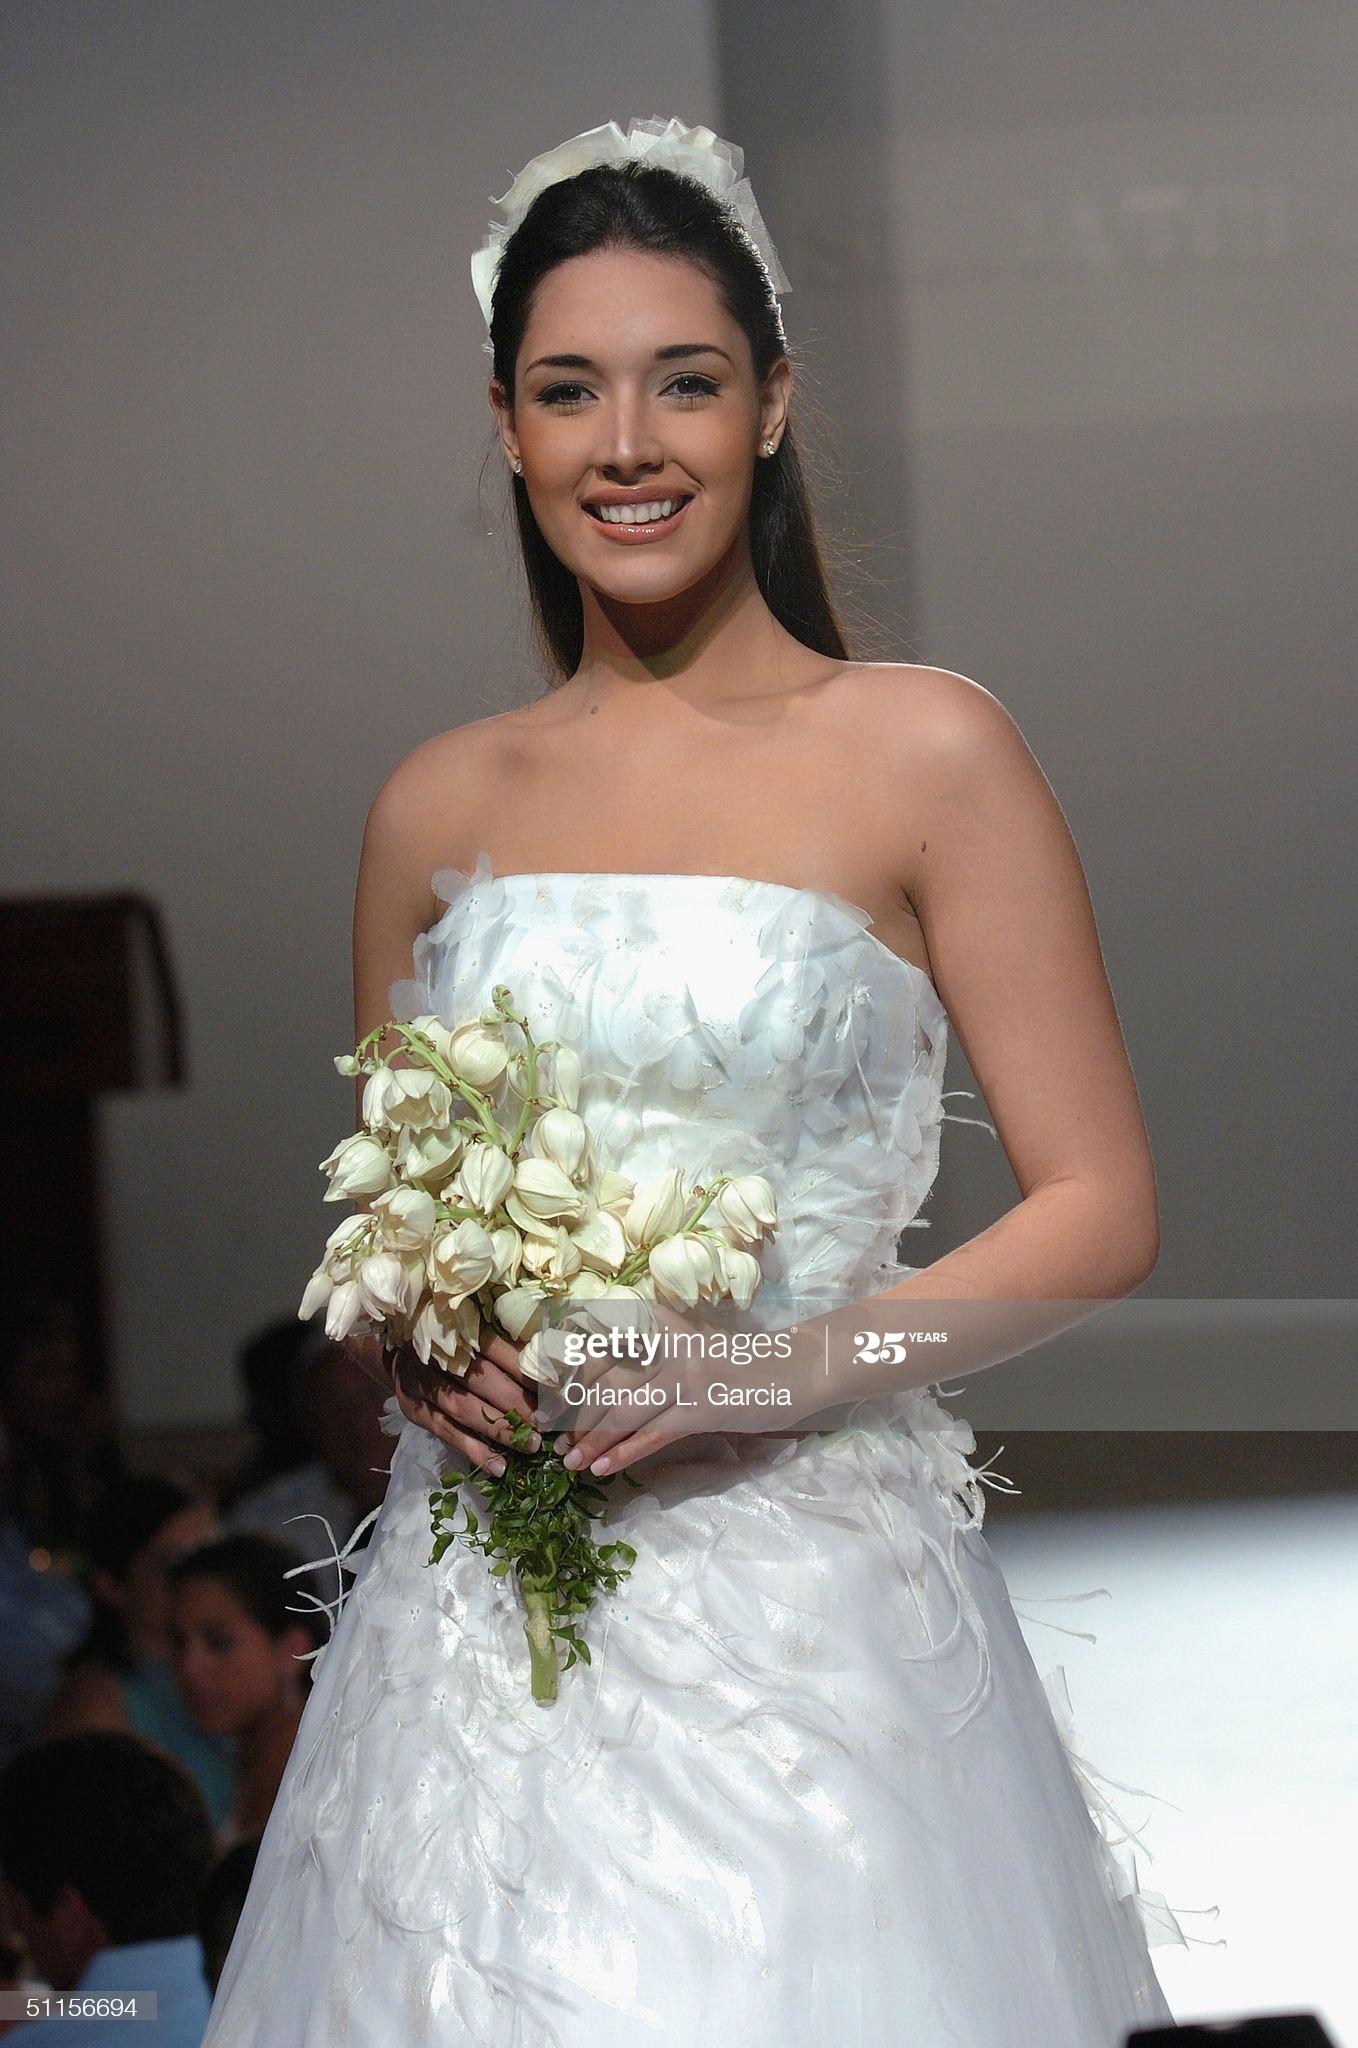 ════ ∘◦❁◦∘ ════ Amelia Vega, Miss Universe 2003. ════ ∘◦❁◦∘ ════ - Página 13 Former13